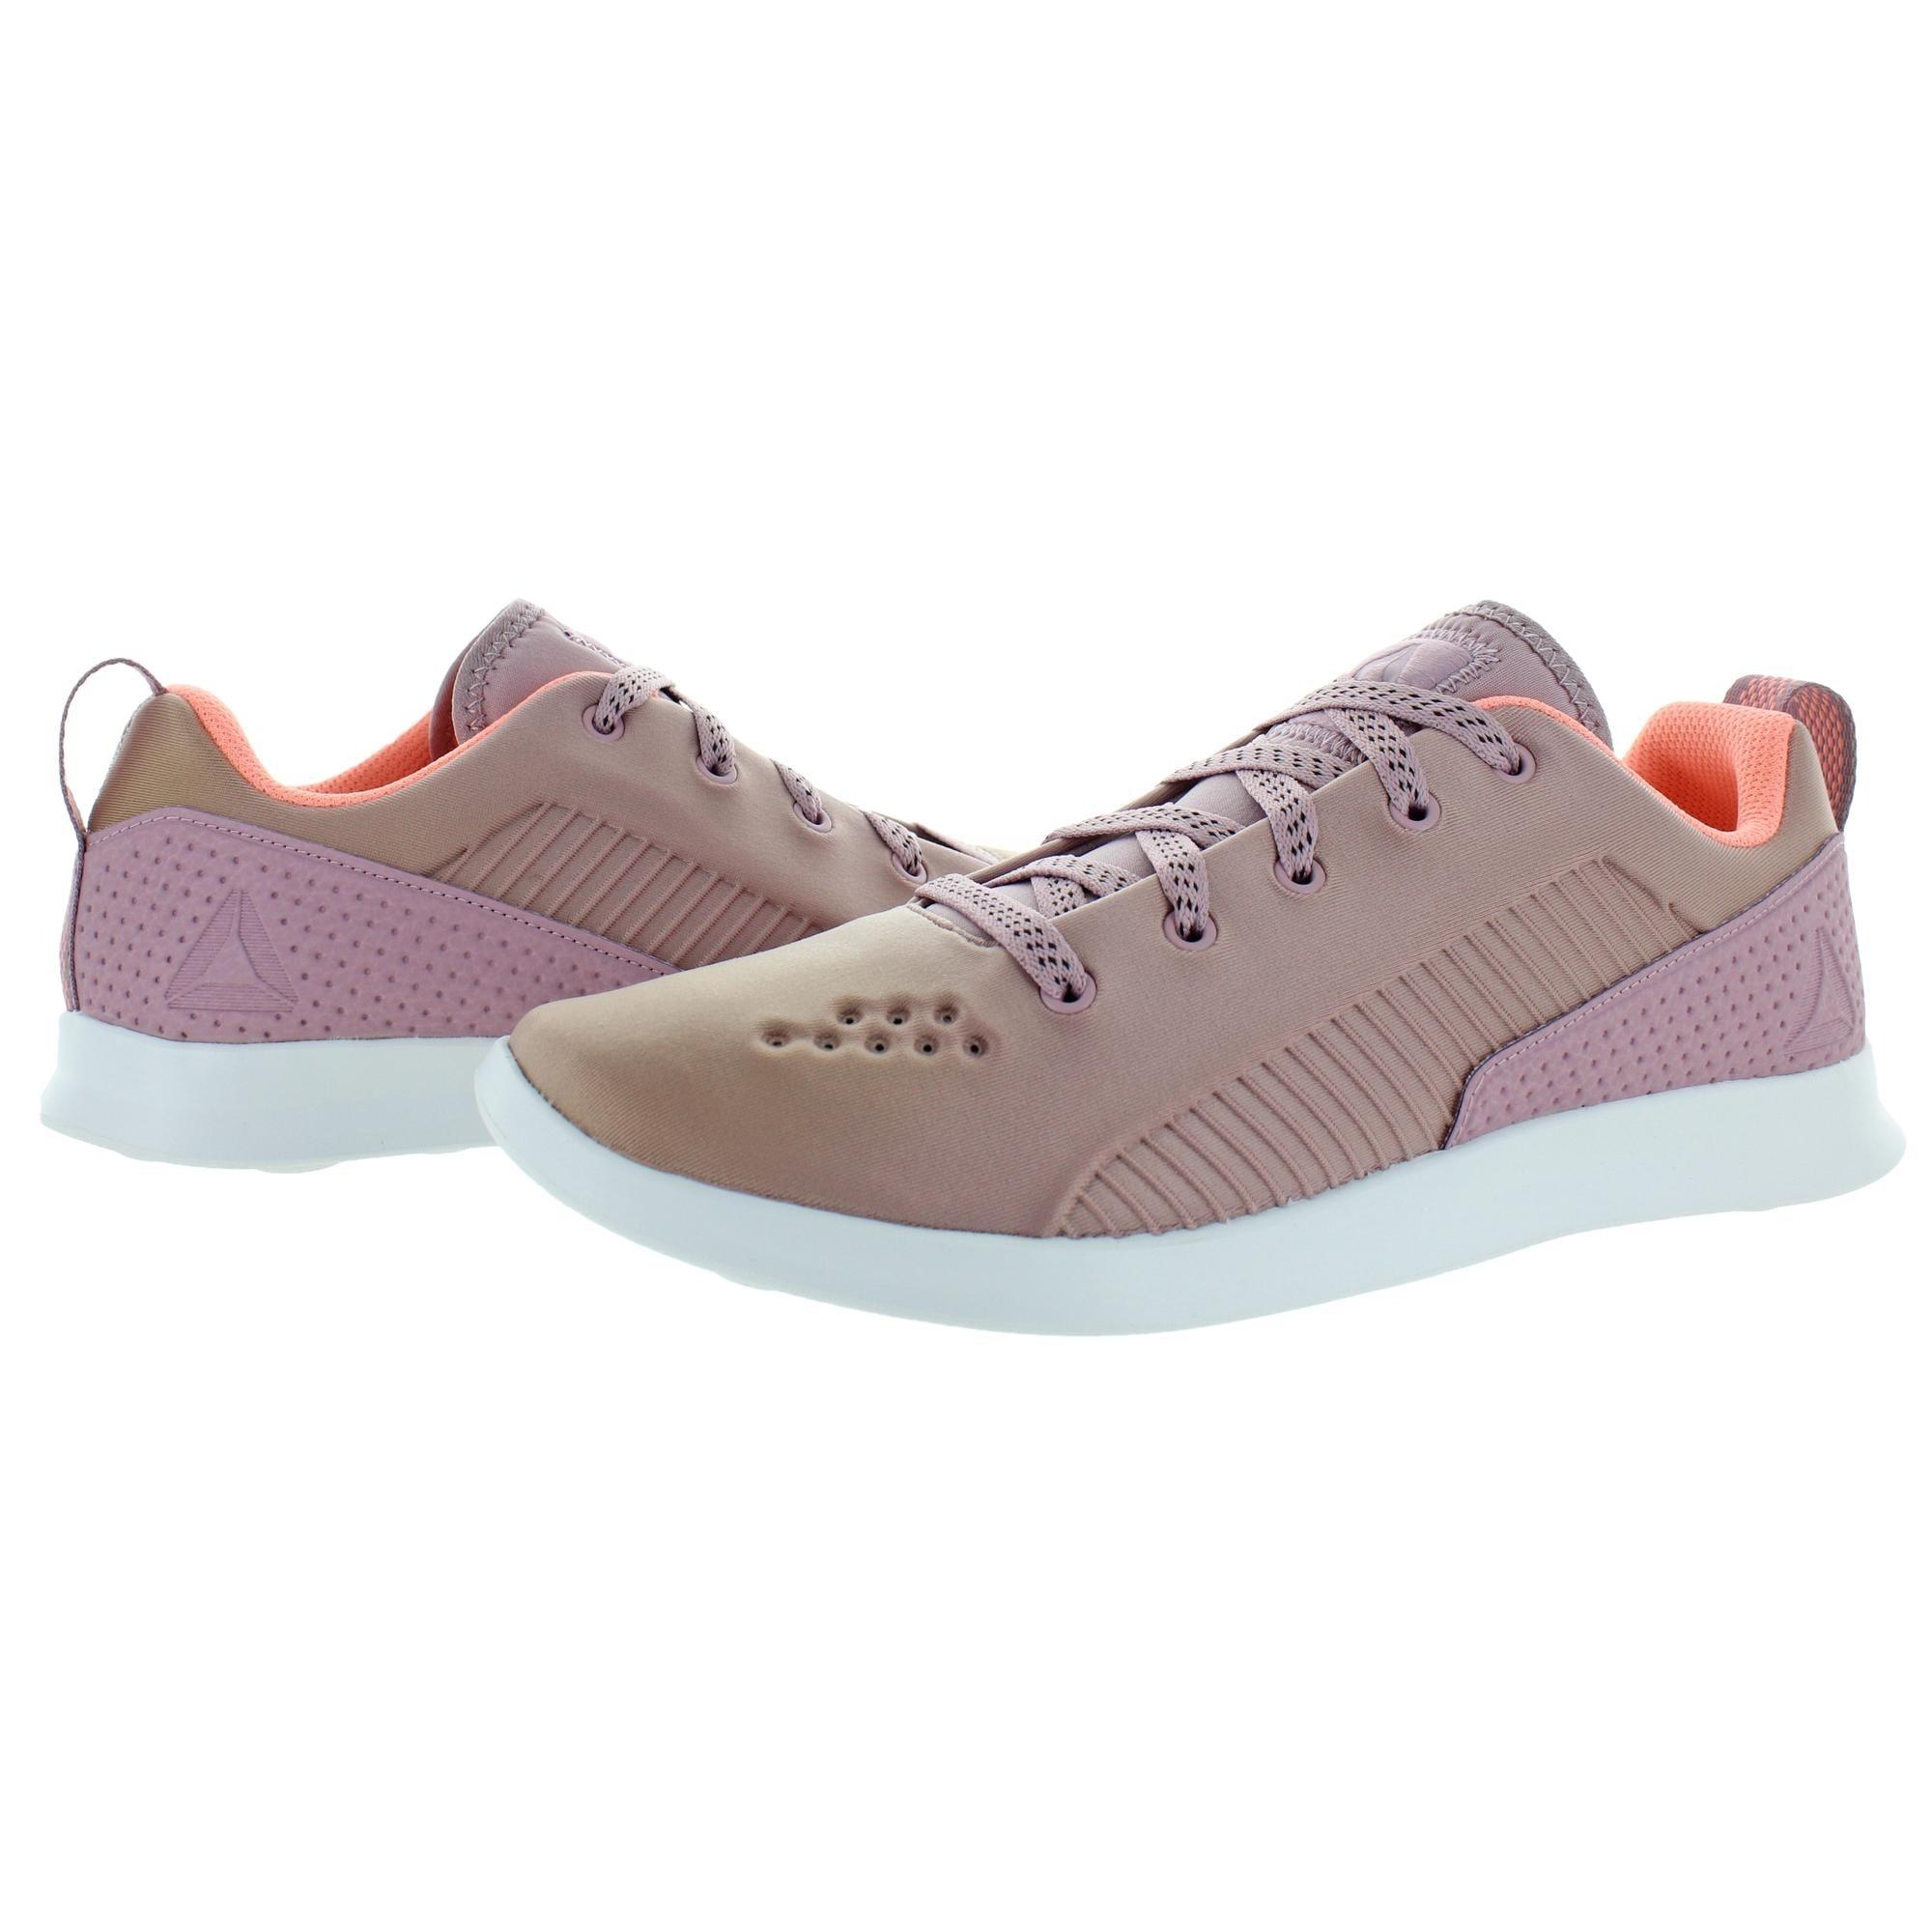 reebok moving air shoes price